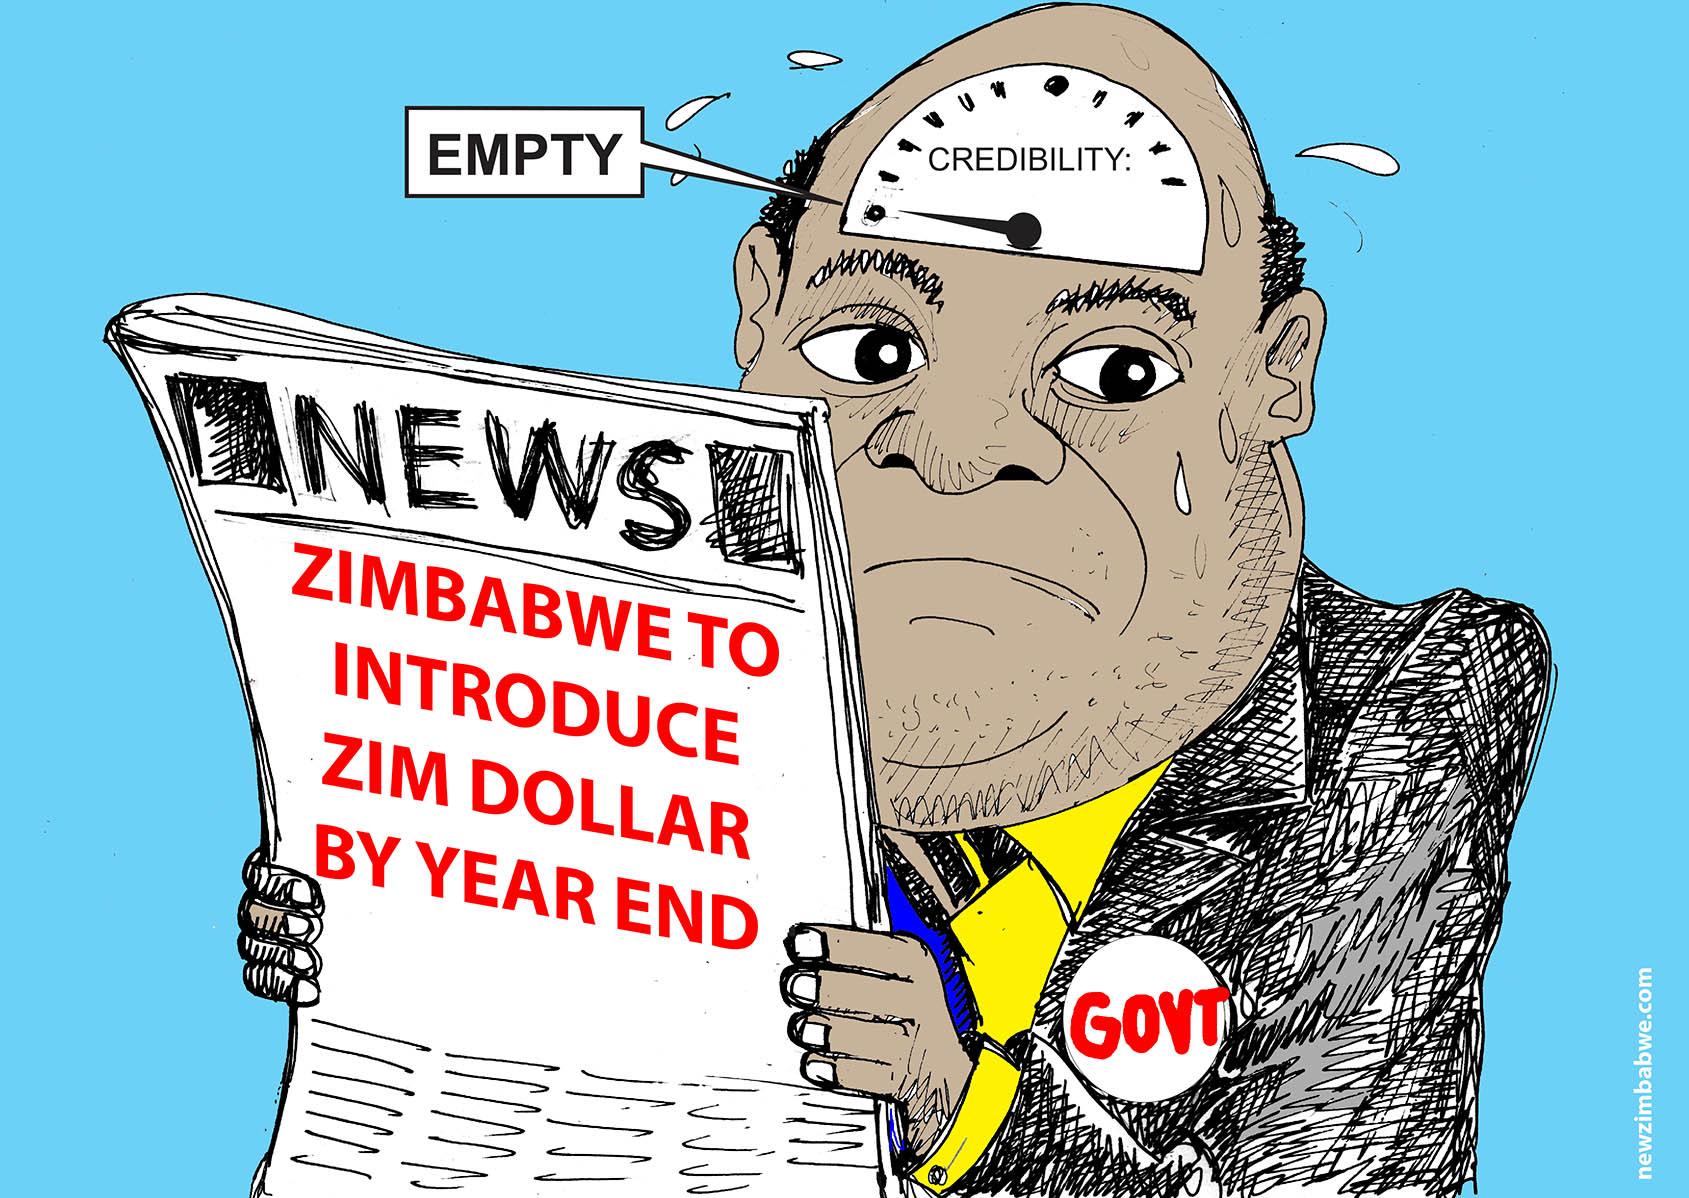 Zim to introduce new Zim Dollar